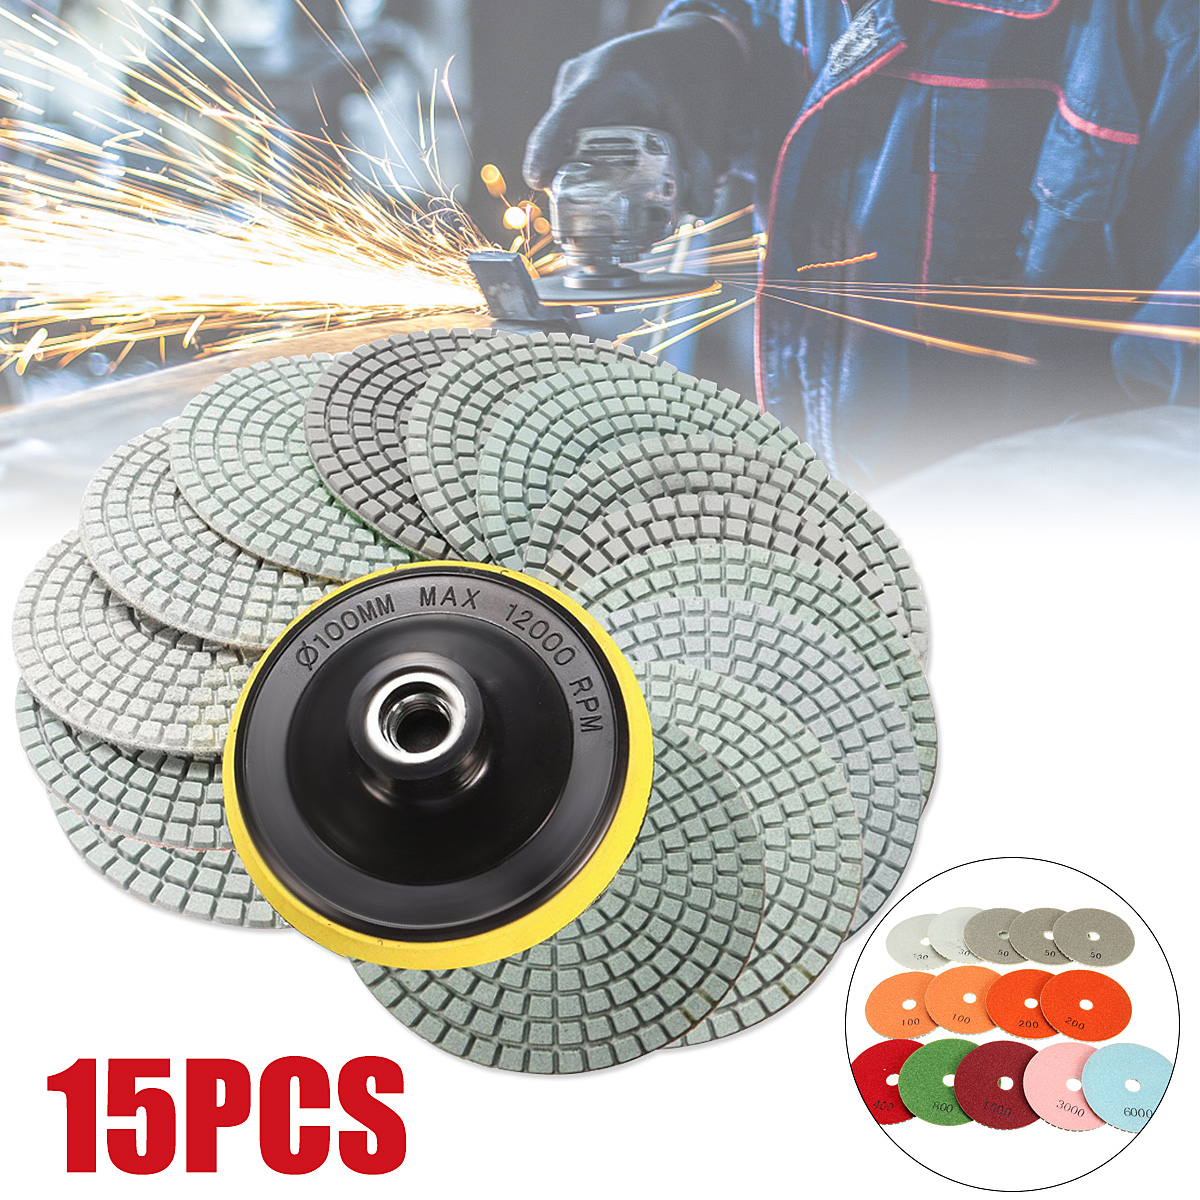 14Pcs 100mm 4inch Wet Dry Diamond Polishing Pad Grit 30#50#100#200#400#800#1500#3000#6000#+M14 For Granite Concrete Stone Marble